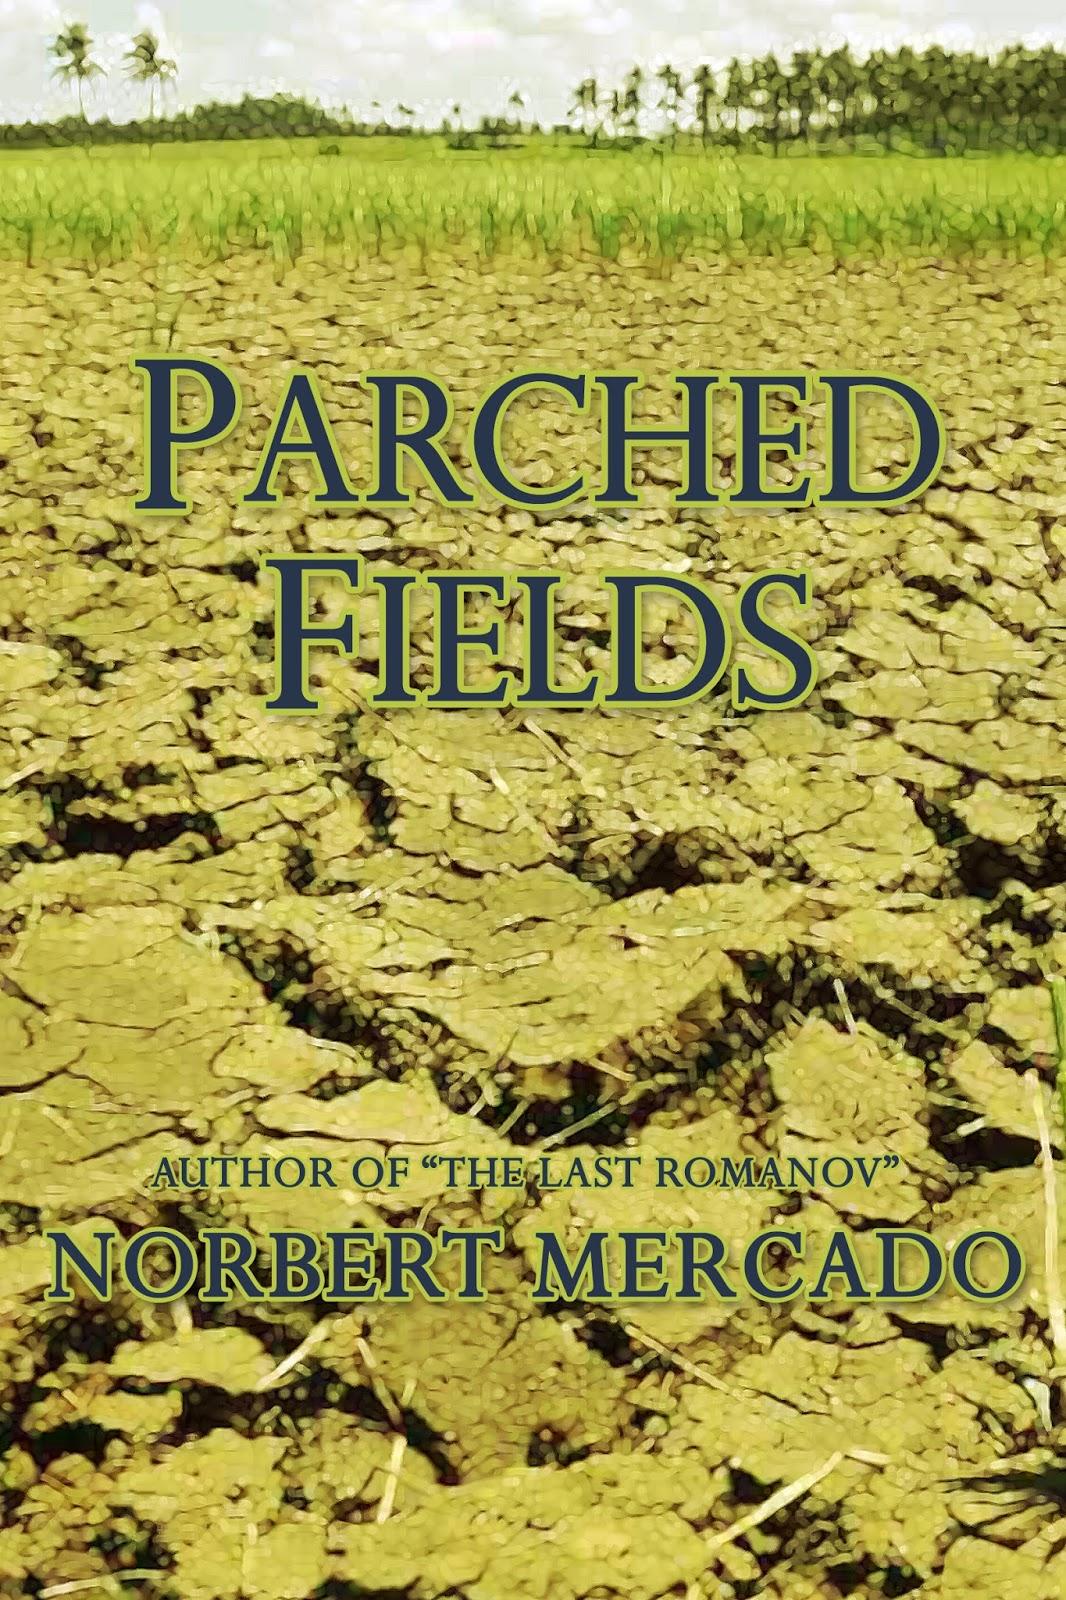 Parched Fields €�